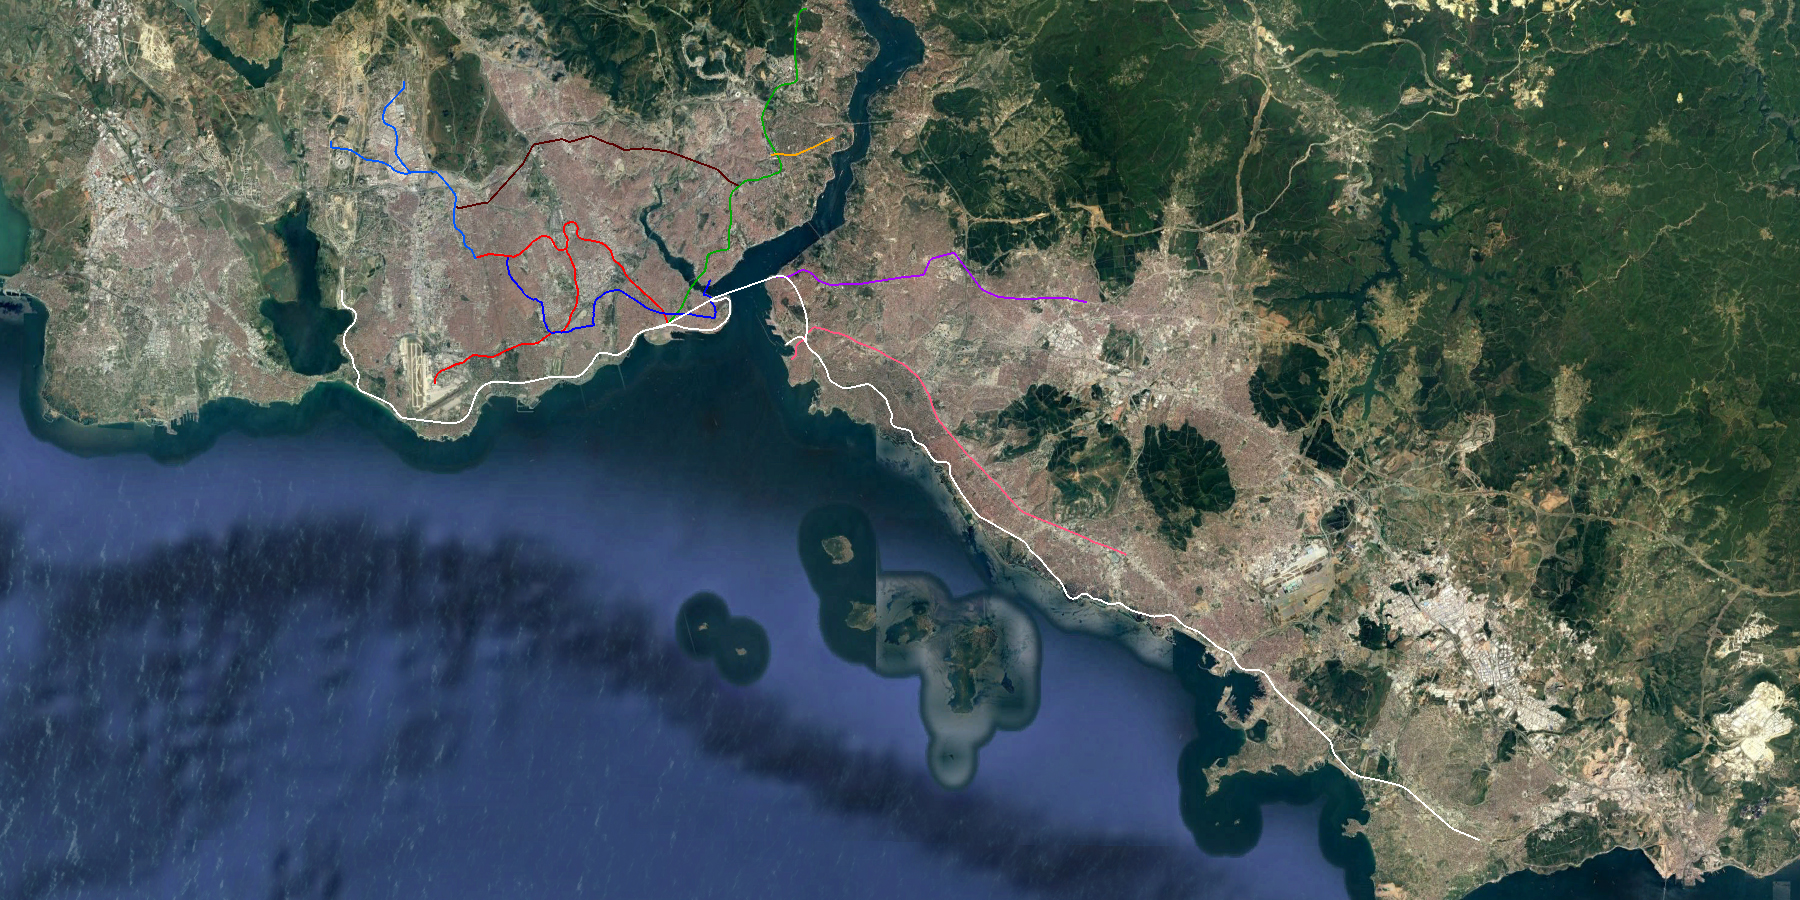 URBA-World-TRANSPORT-METRO-Istanbul